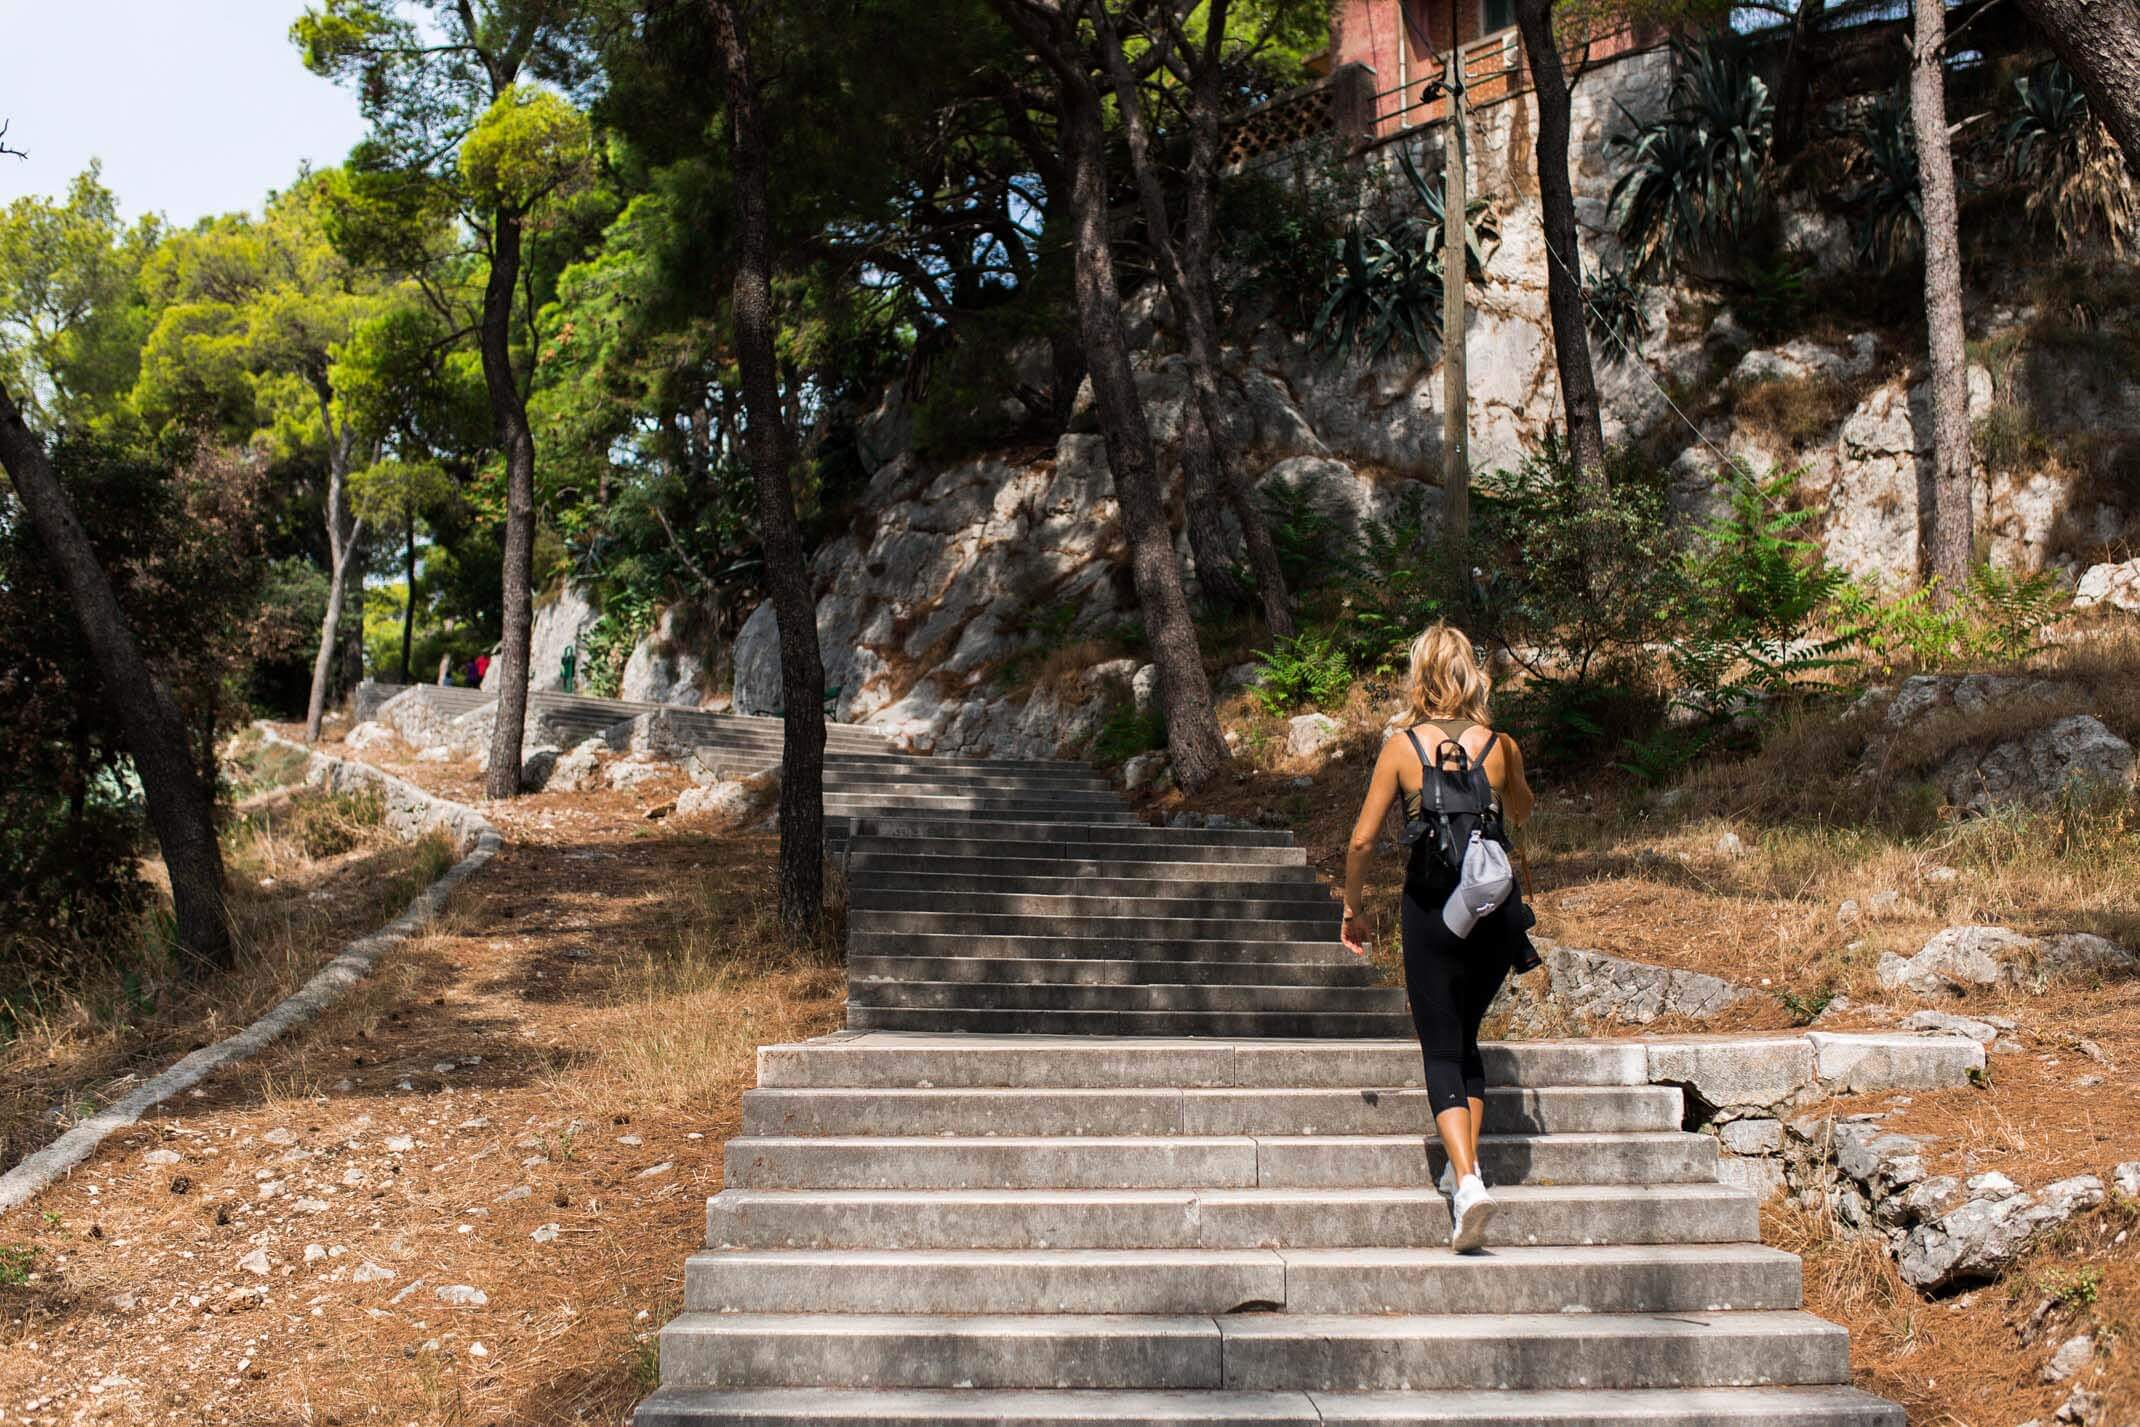 a-complete-guide-to-exploring-split-croatia-14-2